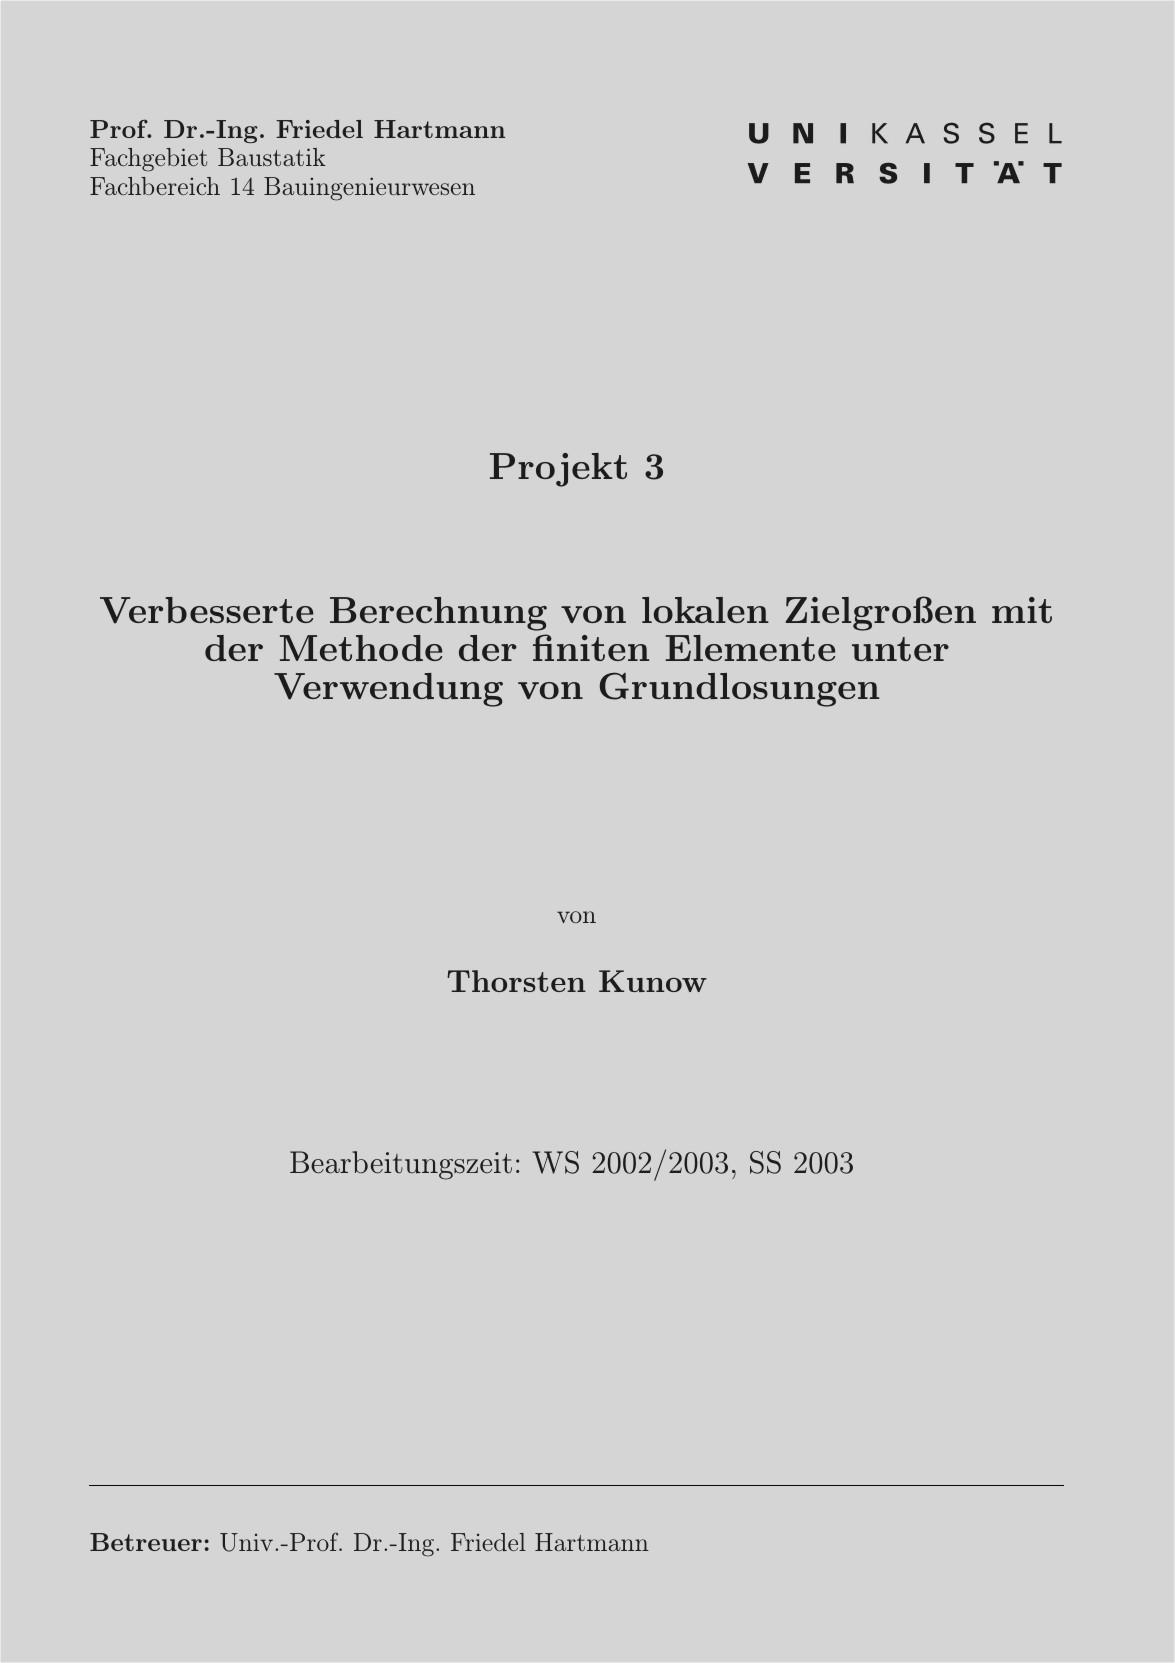 Deckblatt Dissertation Uni Kassel